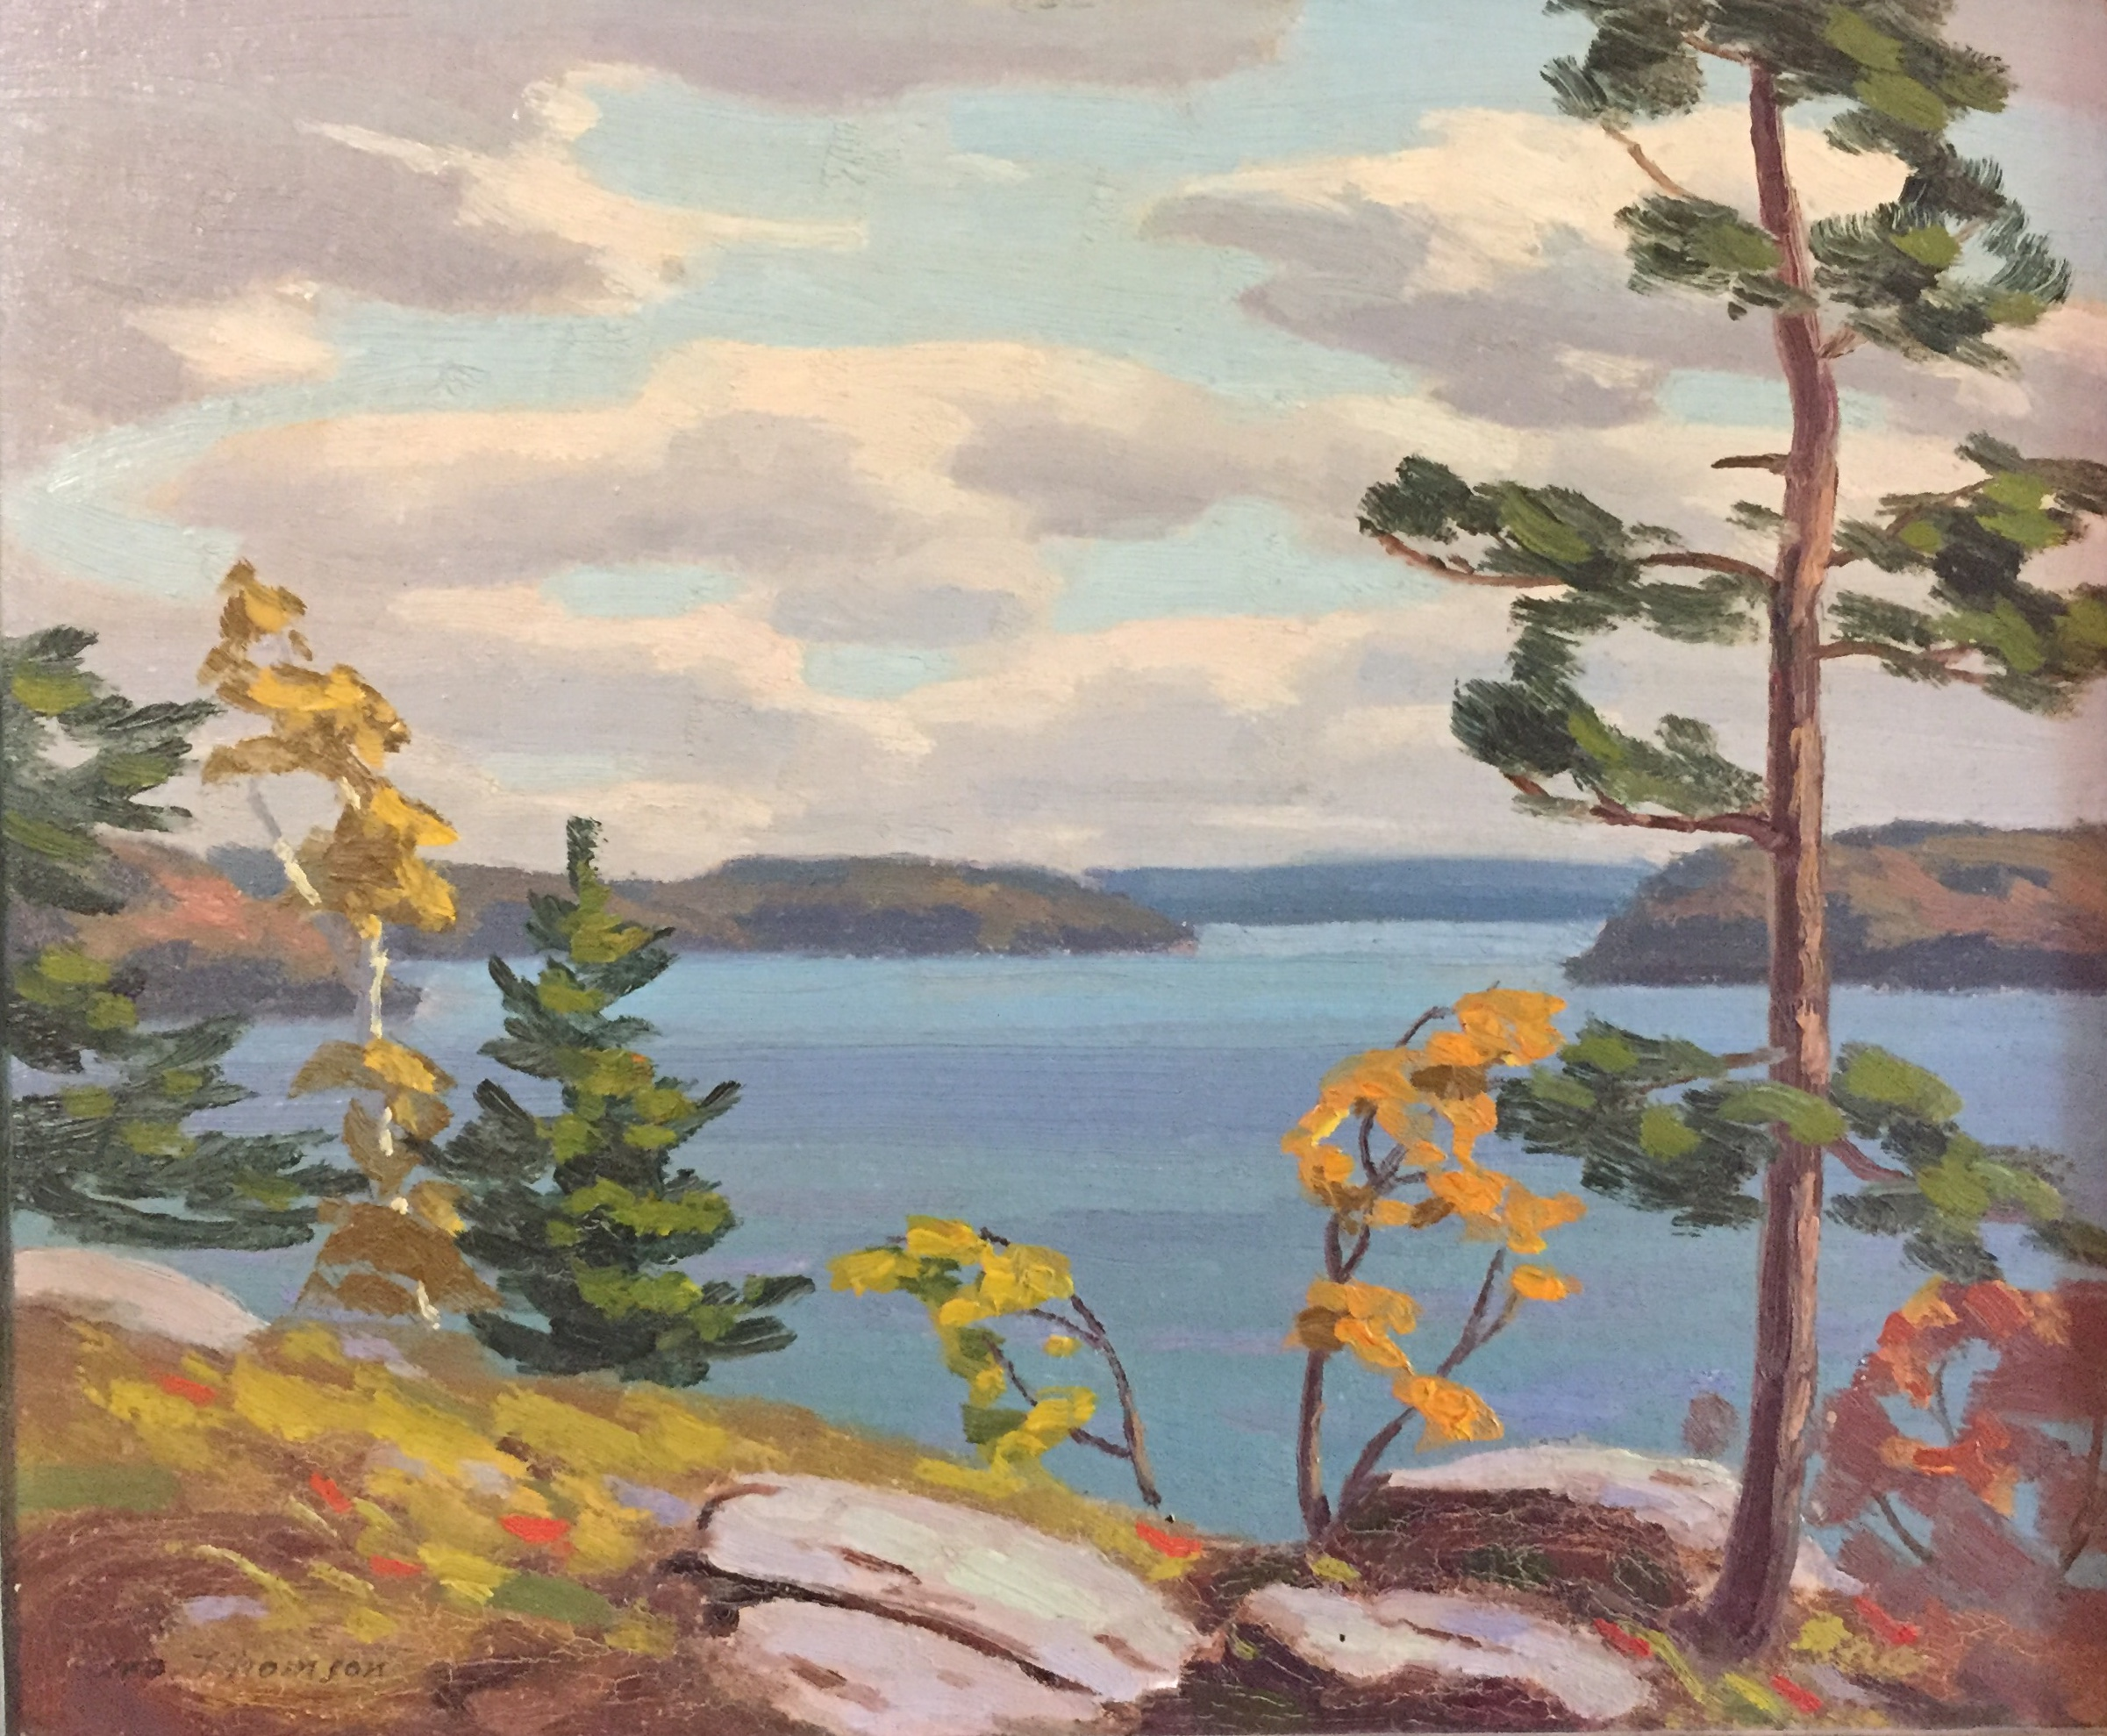 "george thomson 'lake muskoka' - (1865-1965, brother of Tom Thomson)10"" x 11.5""oil on boardsigned Geo Thomson lower left"